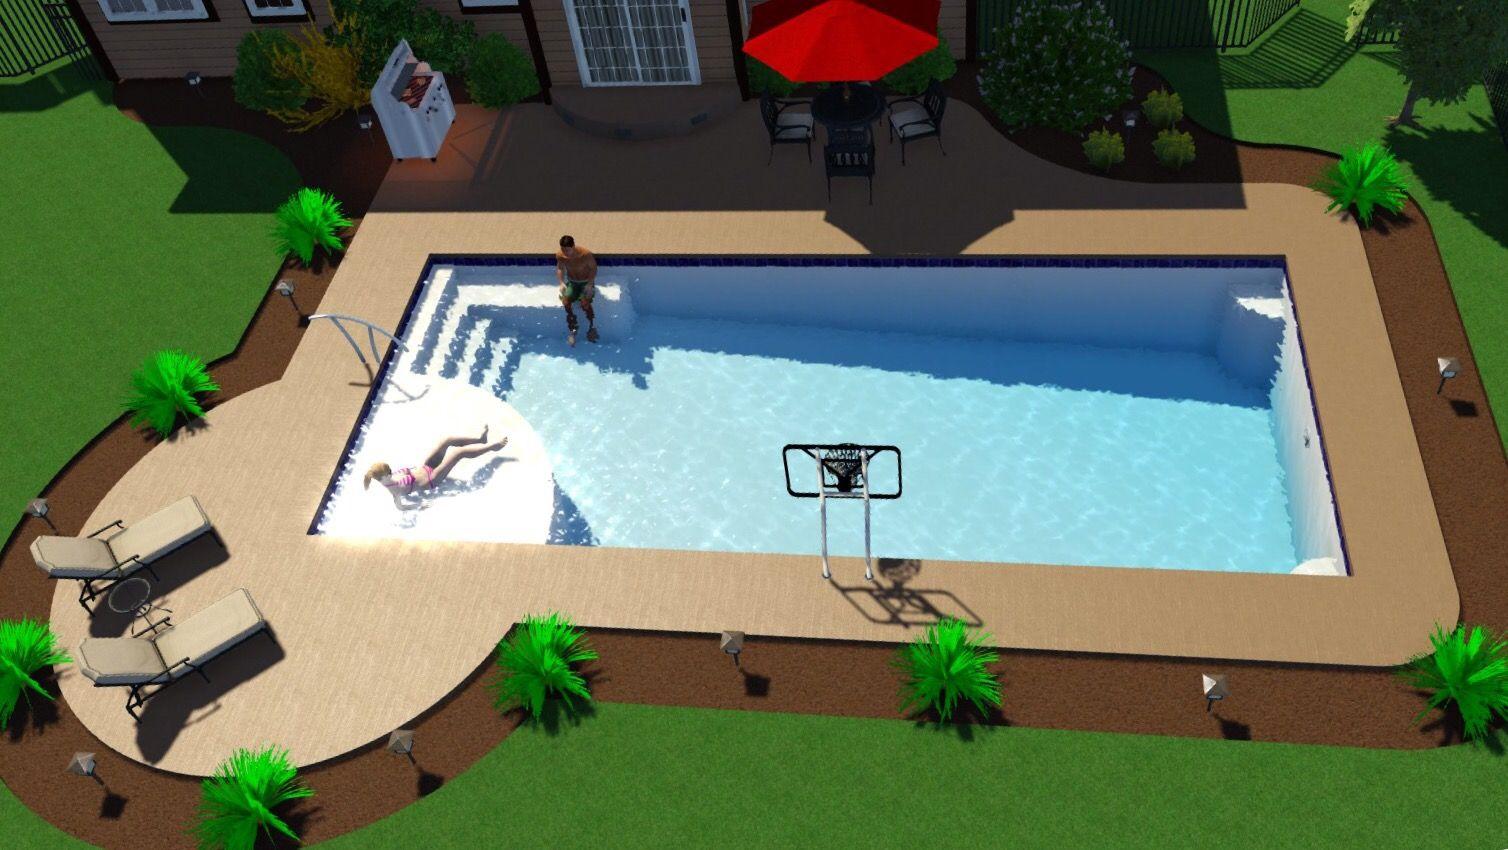 New Great Lakes In Ground Fiberglass Pool By San Juan Fiberglass Pools 16 X37 X6 4 Pools Backyard Inground Inground Pool Landscaping Inground Pool Designs